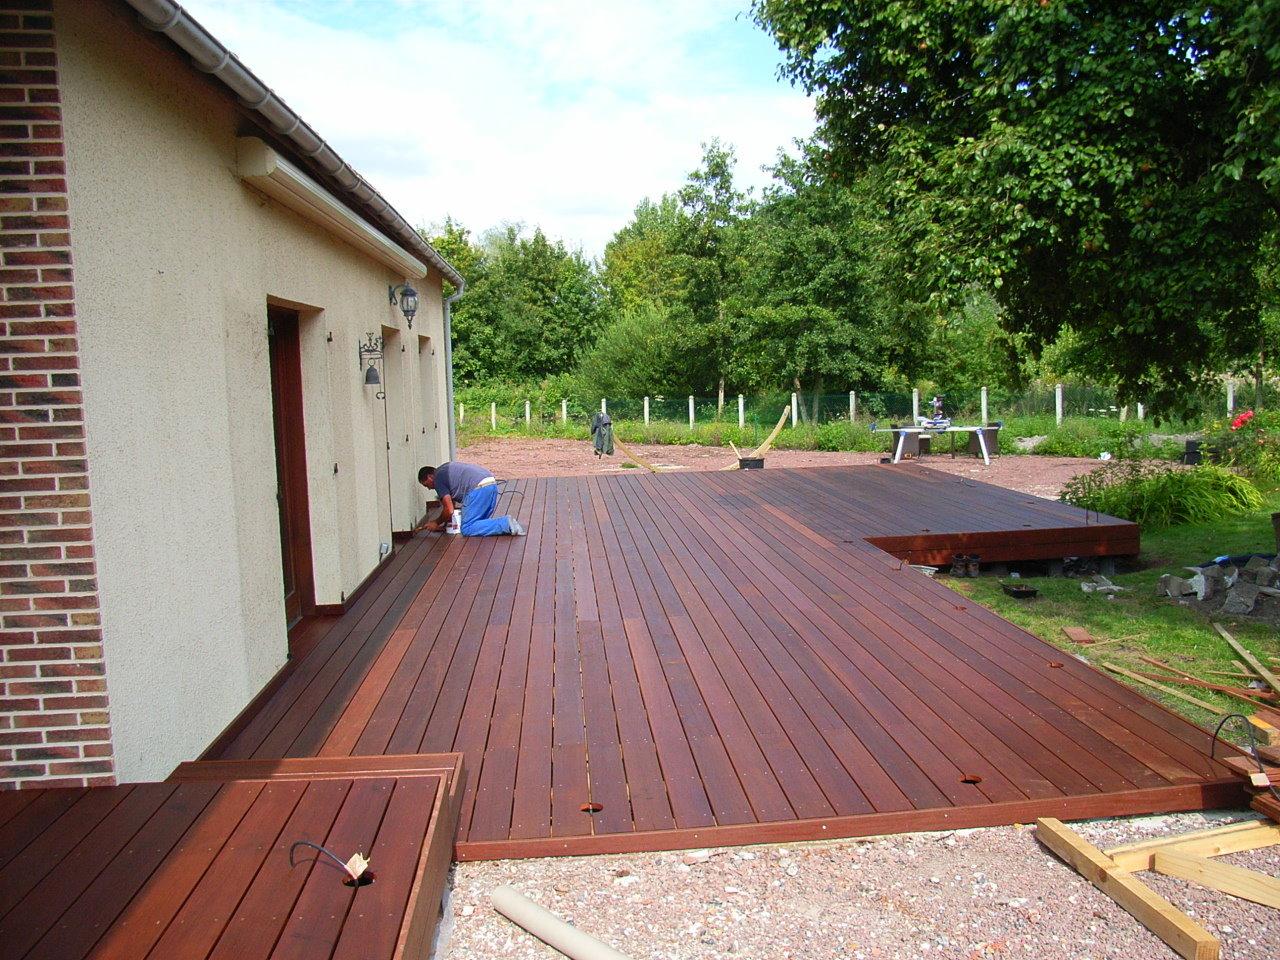 Construire Terrasse En Bois construire une terrasse en bois - paysagiste amiens